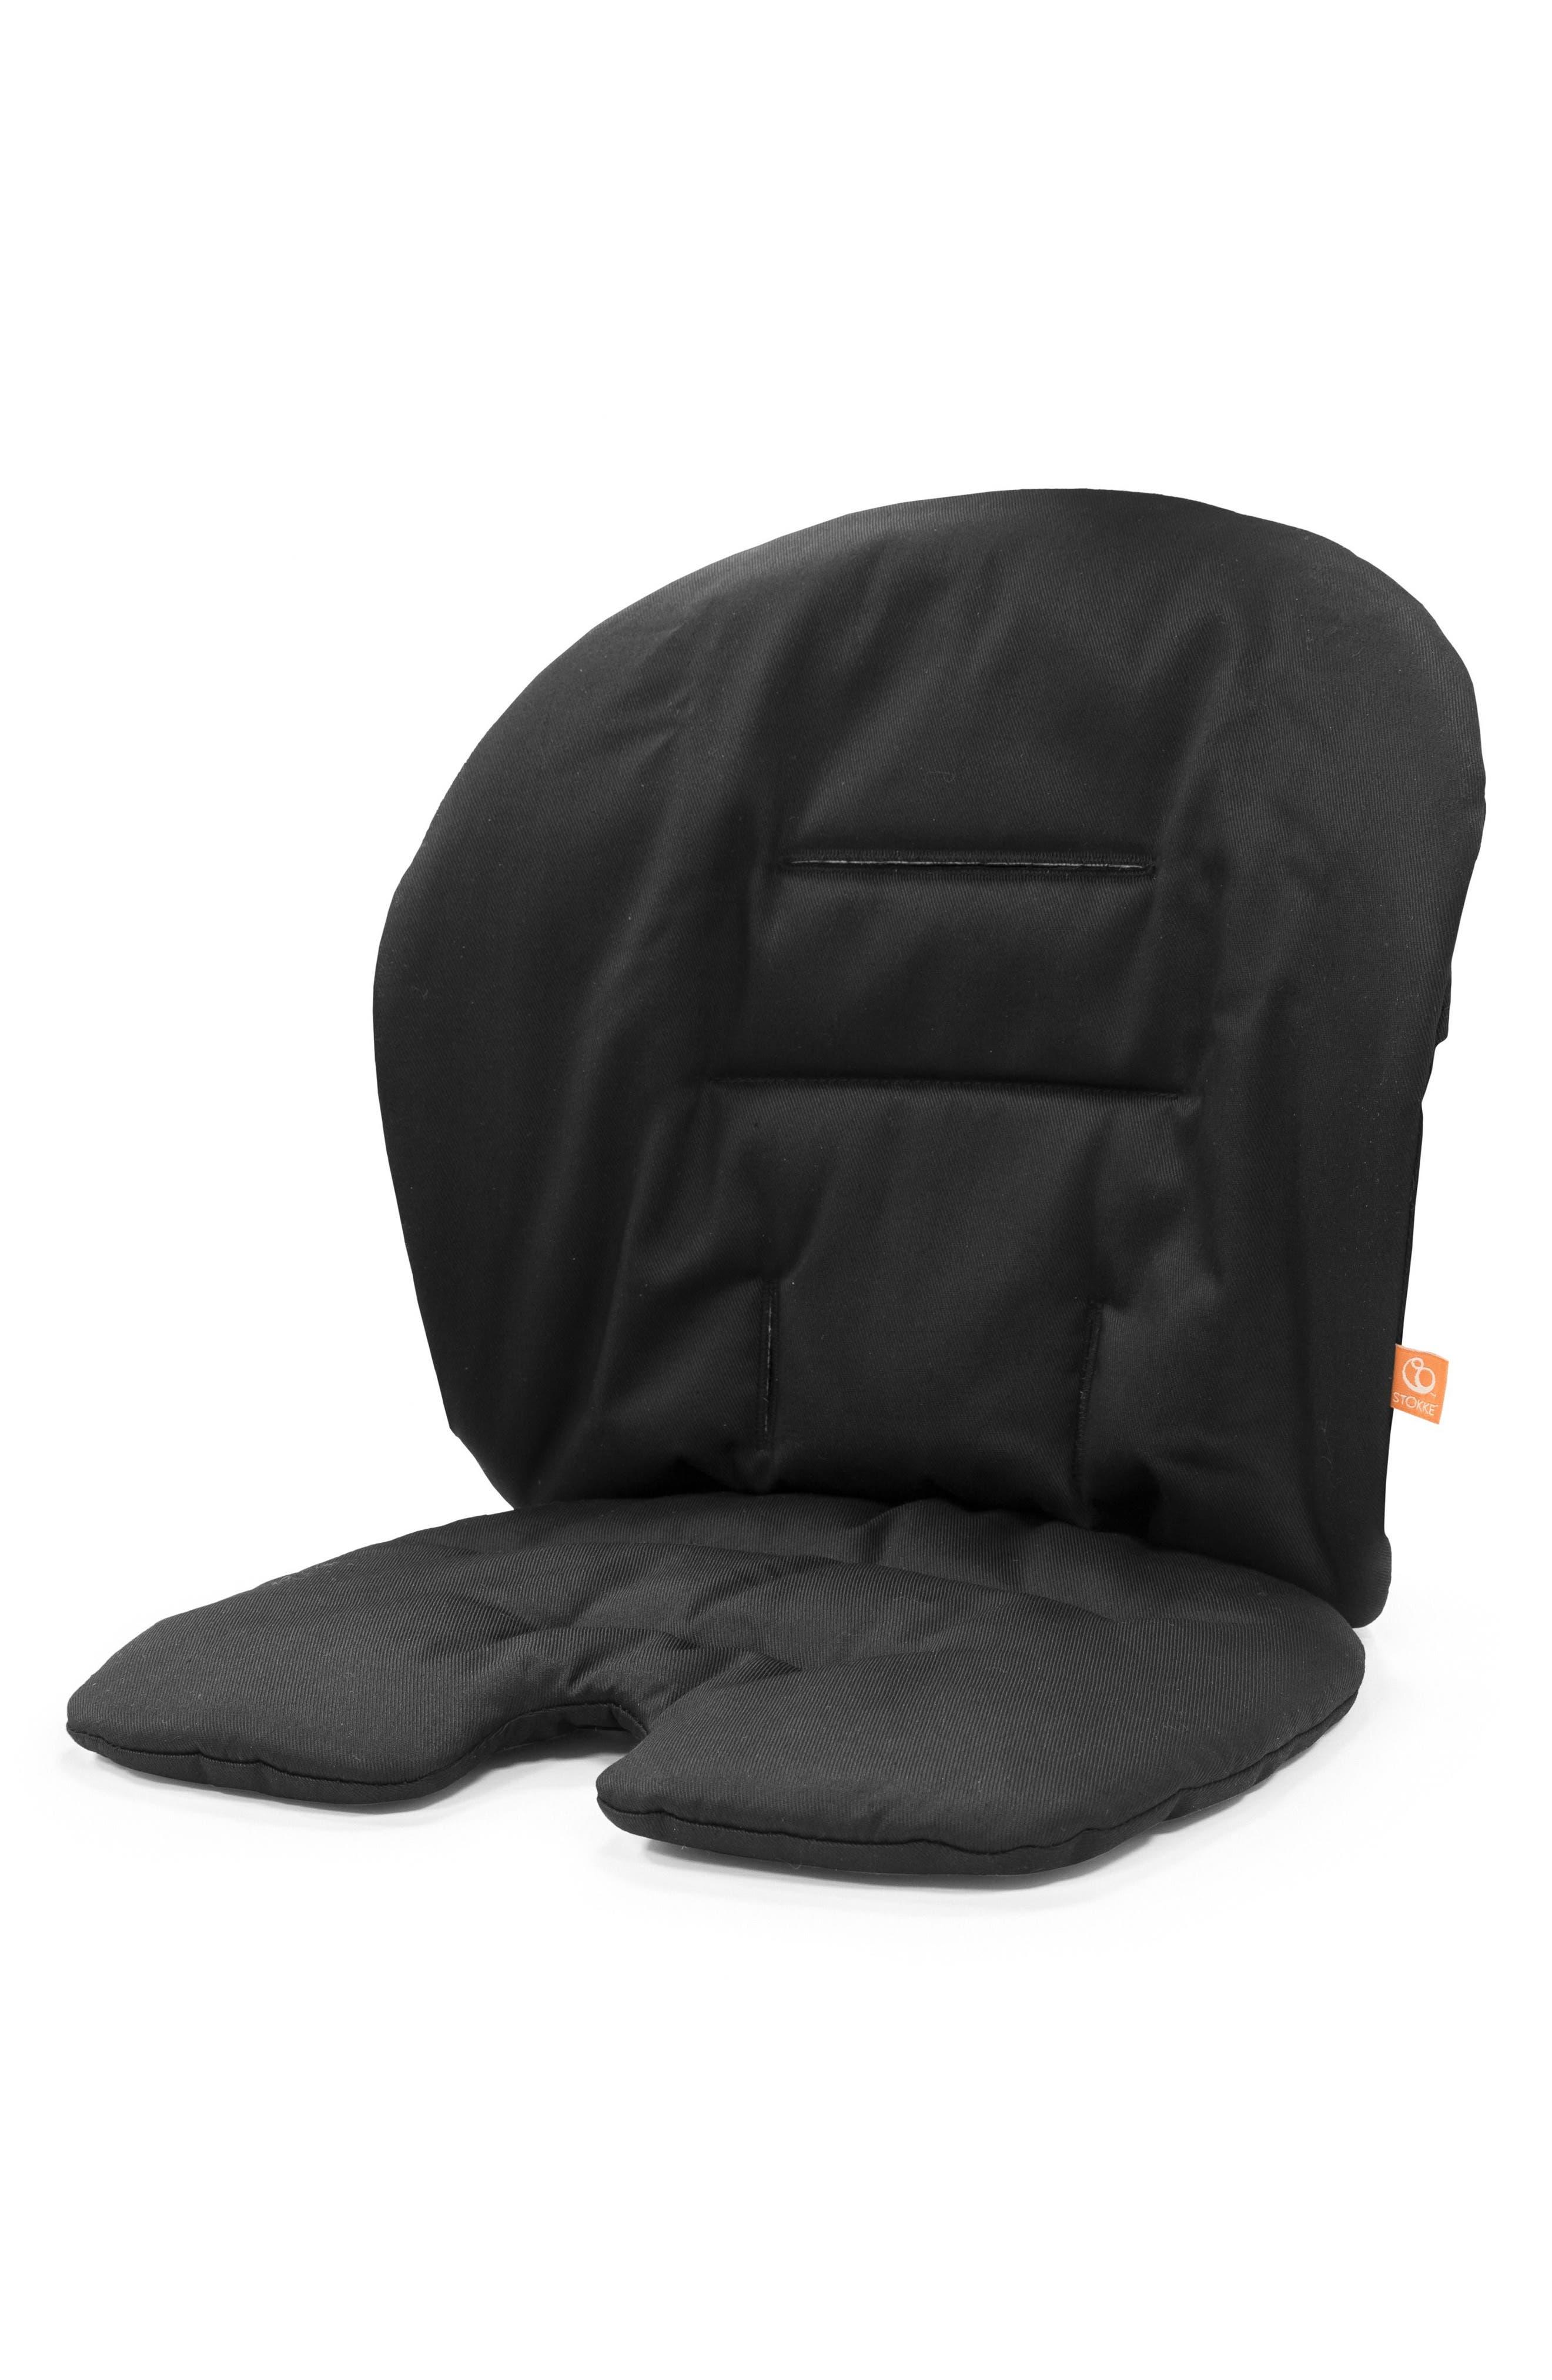 'Steps<sup>™</sup>' Seat Cushion,                             Main thumbnail 1, color,                             Black